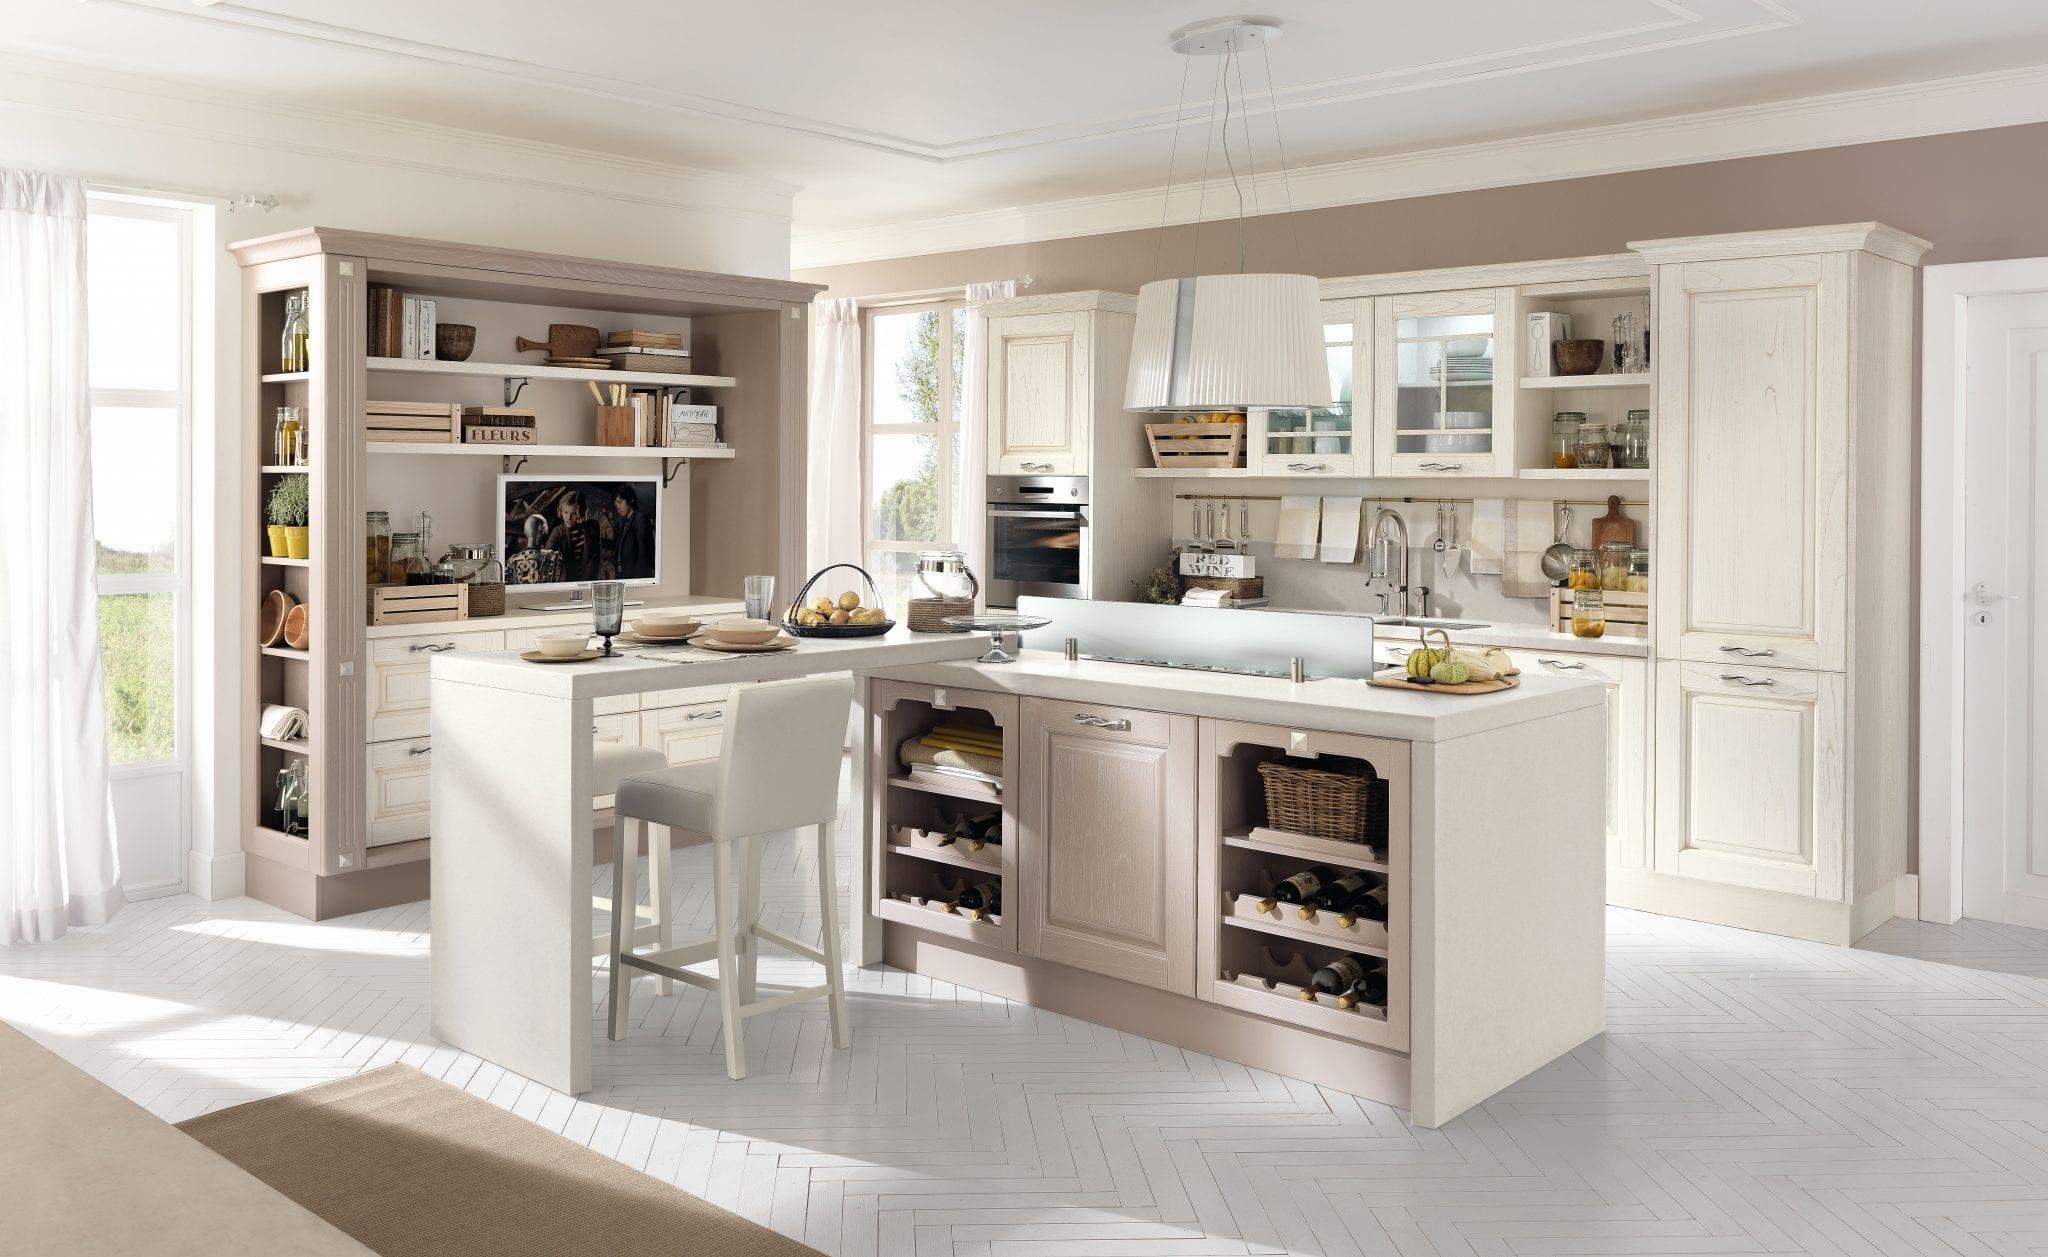 Cucina Lube Raimondi Idee Casa - Cucina Lube Laura Prezzo ...